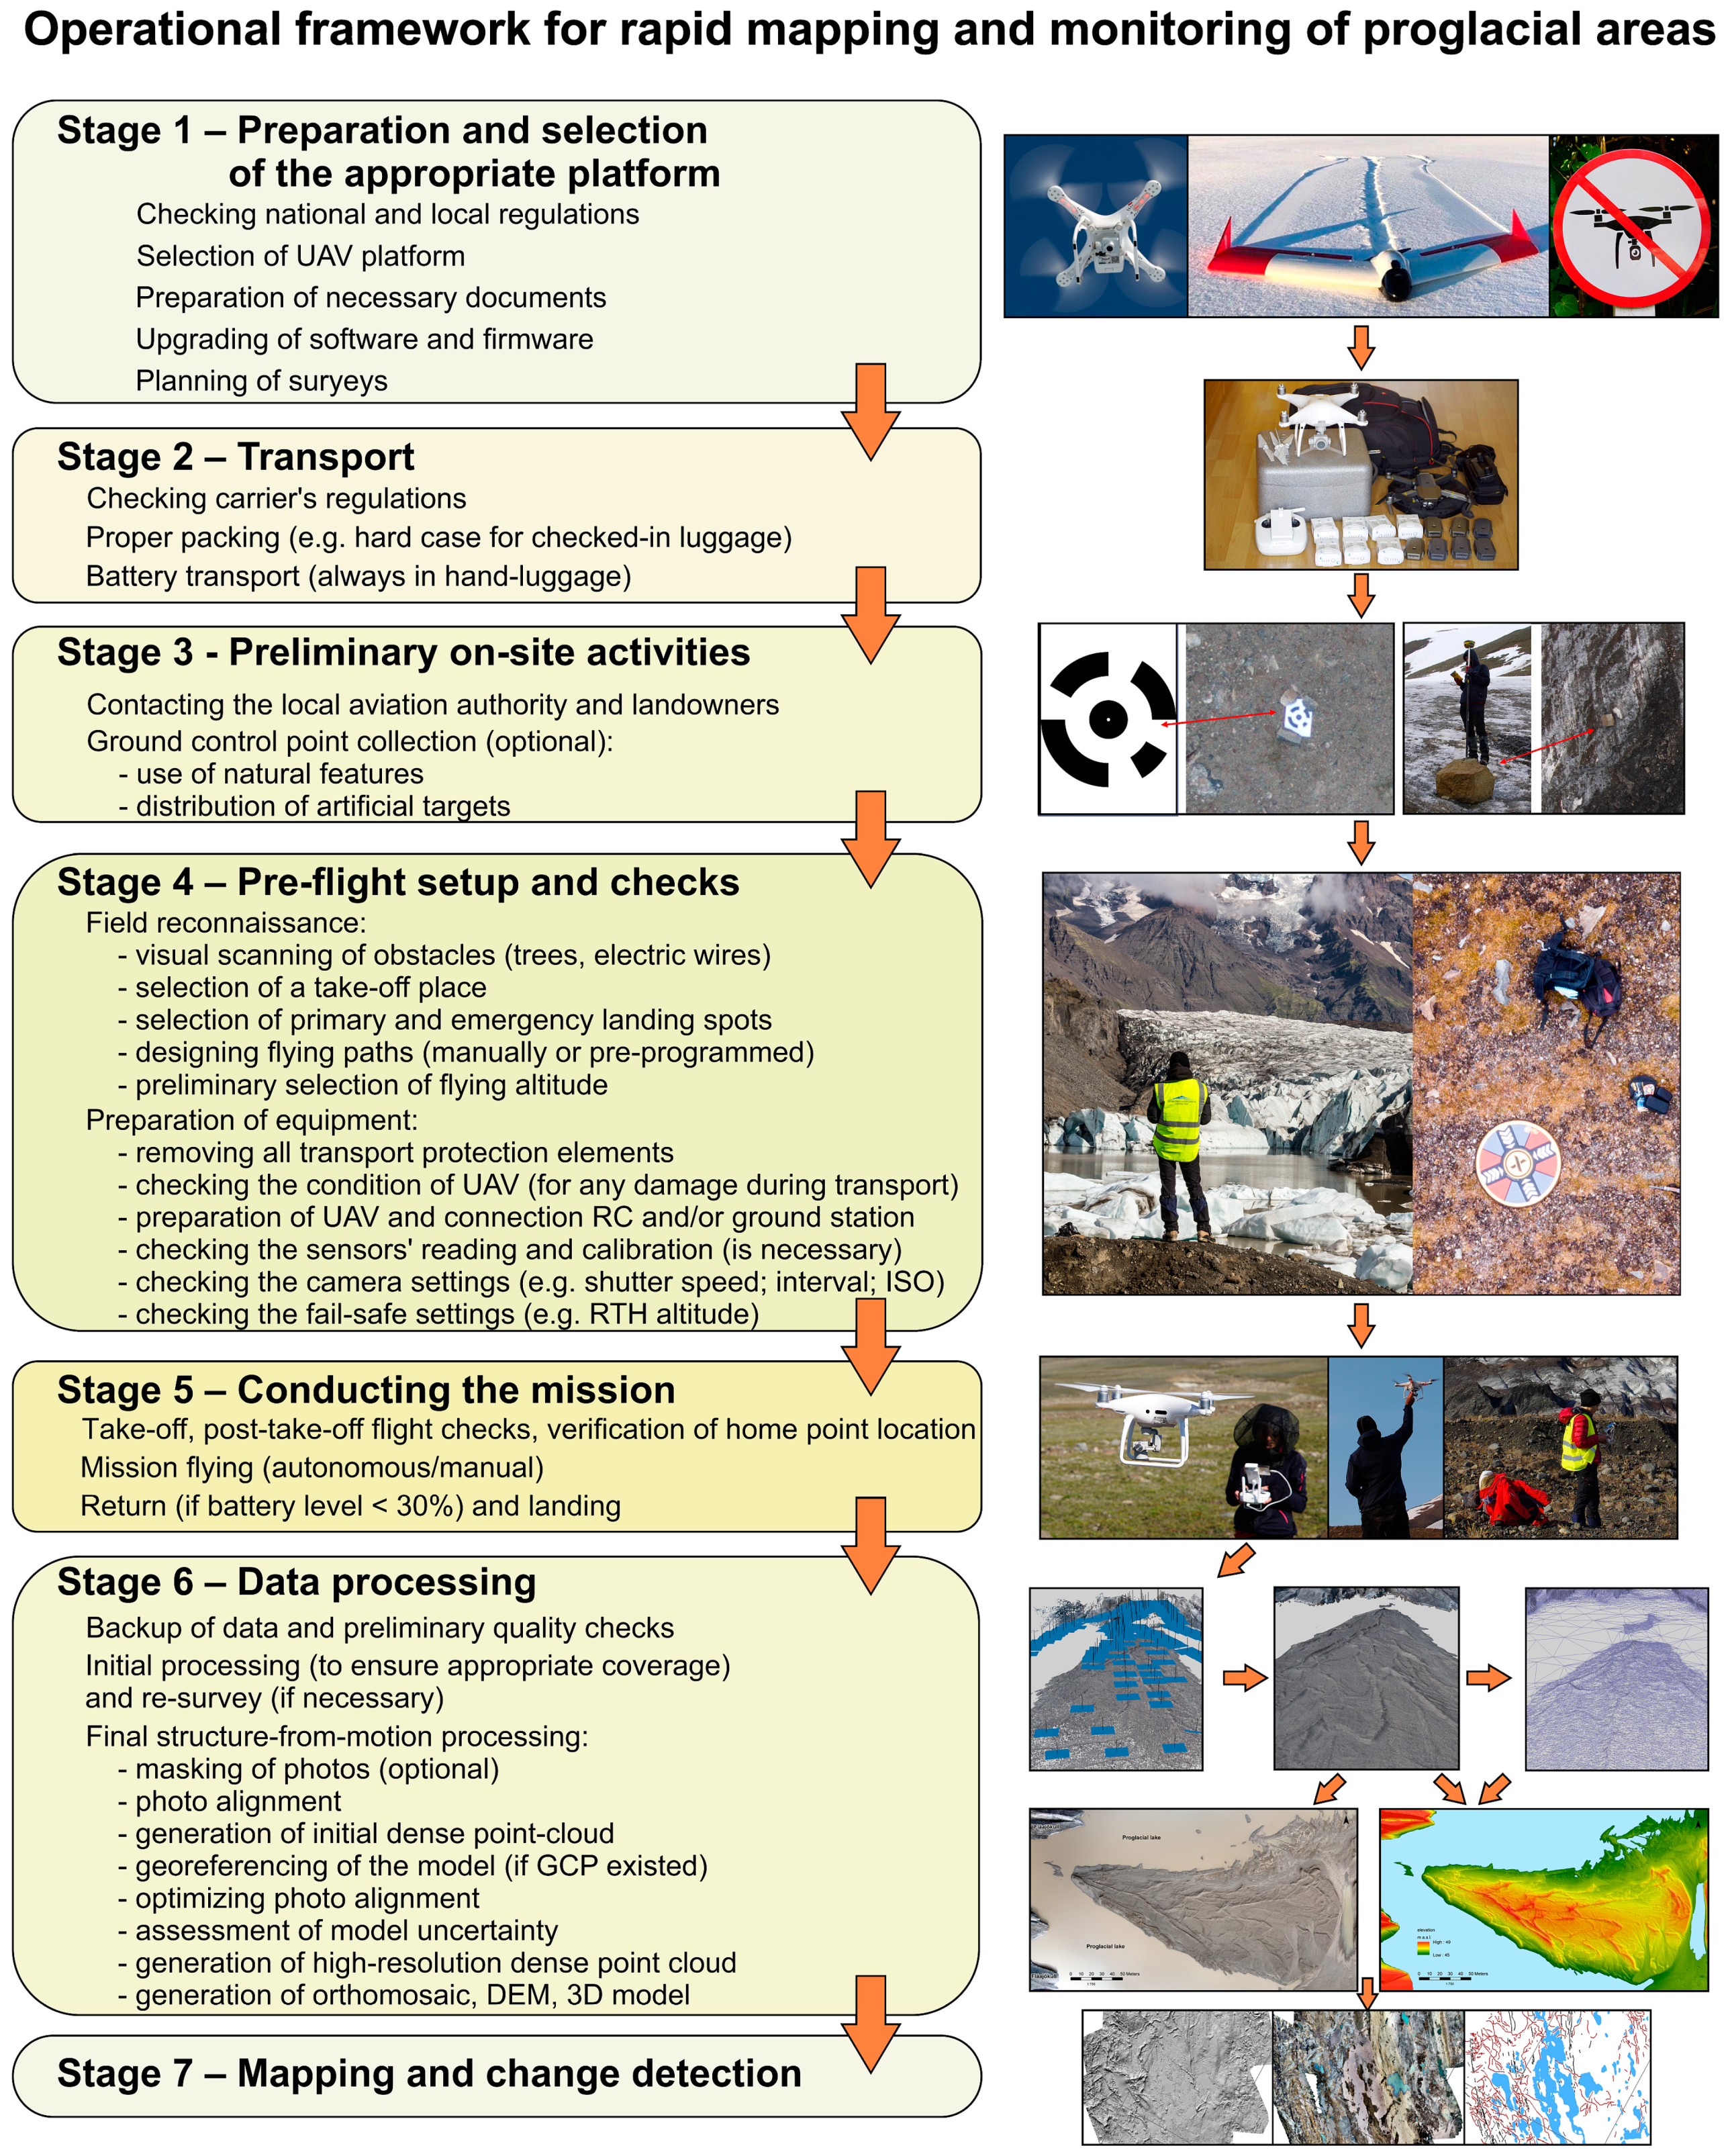 Remote Sensing | Free Full-Text | Operational Framework for